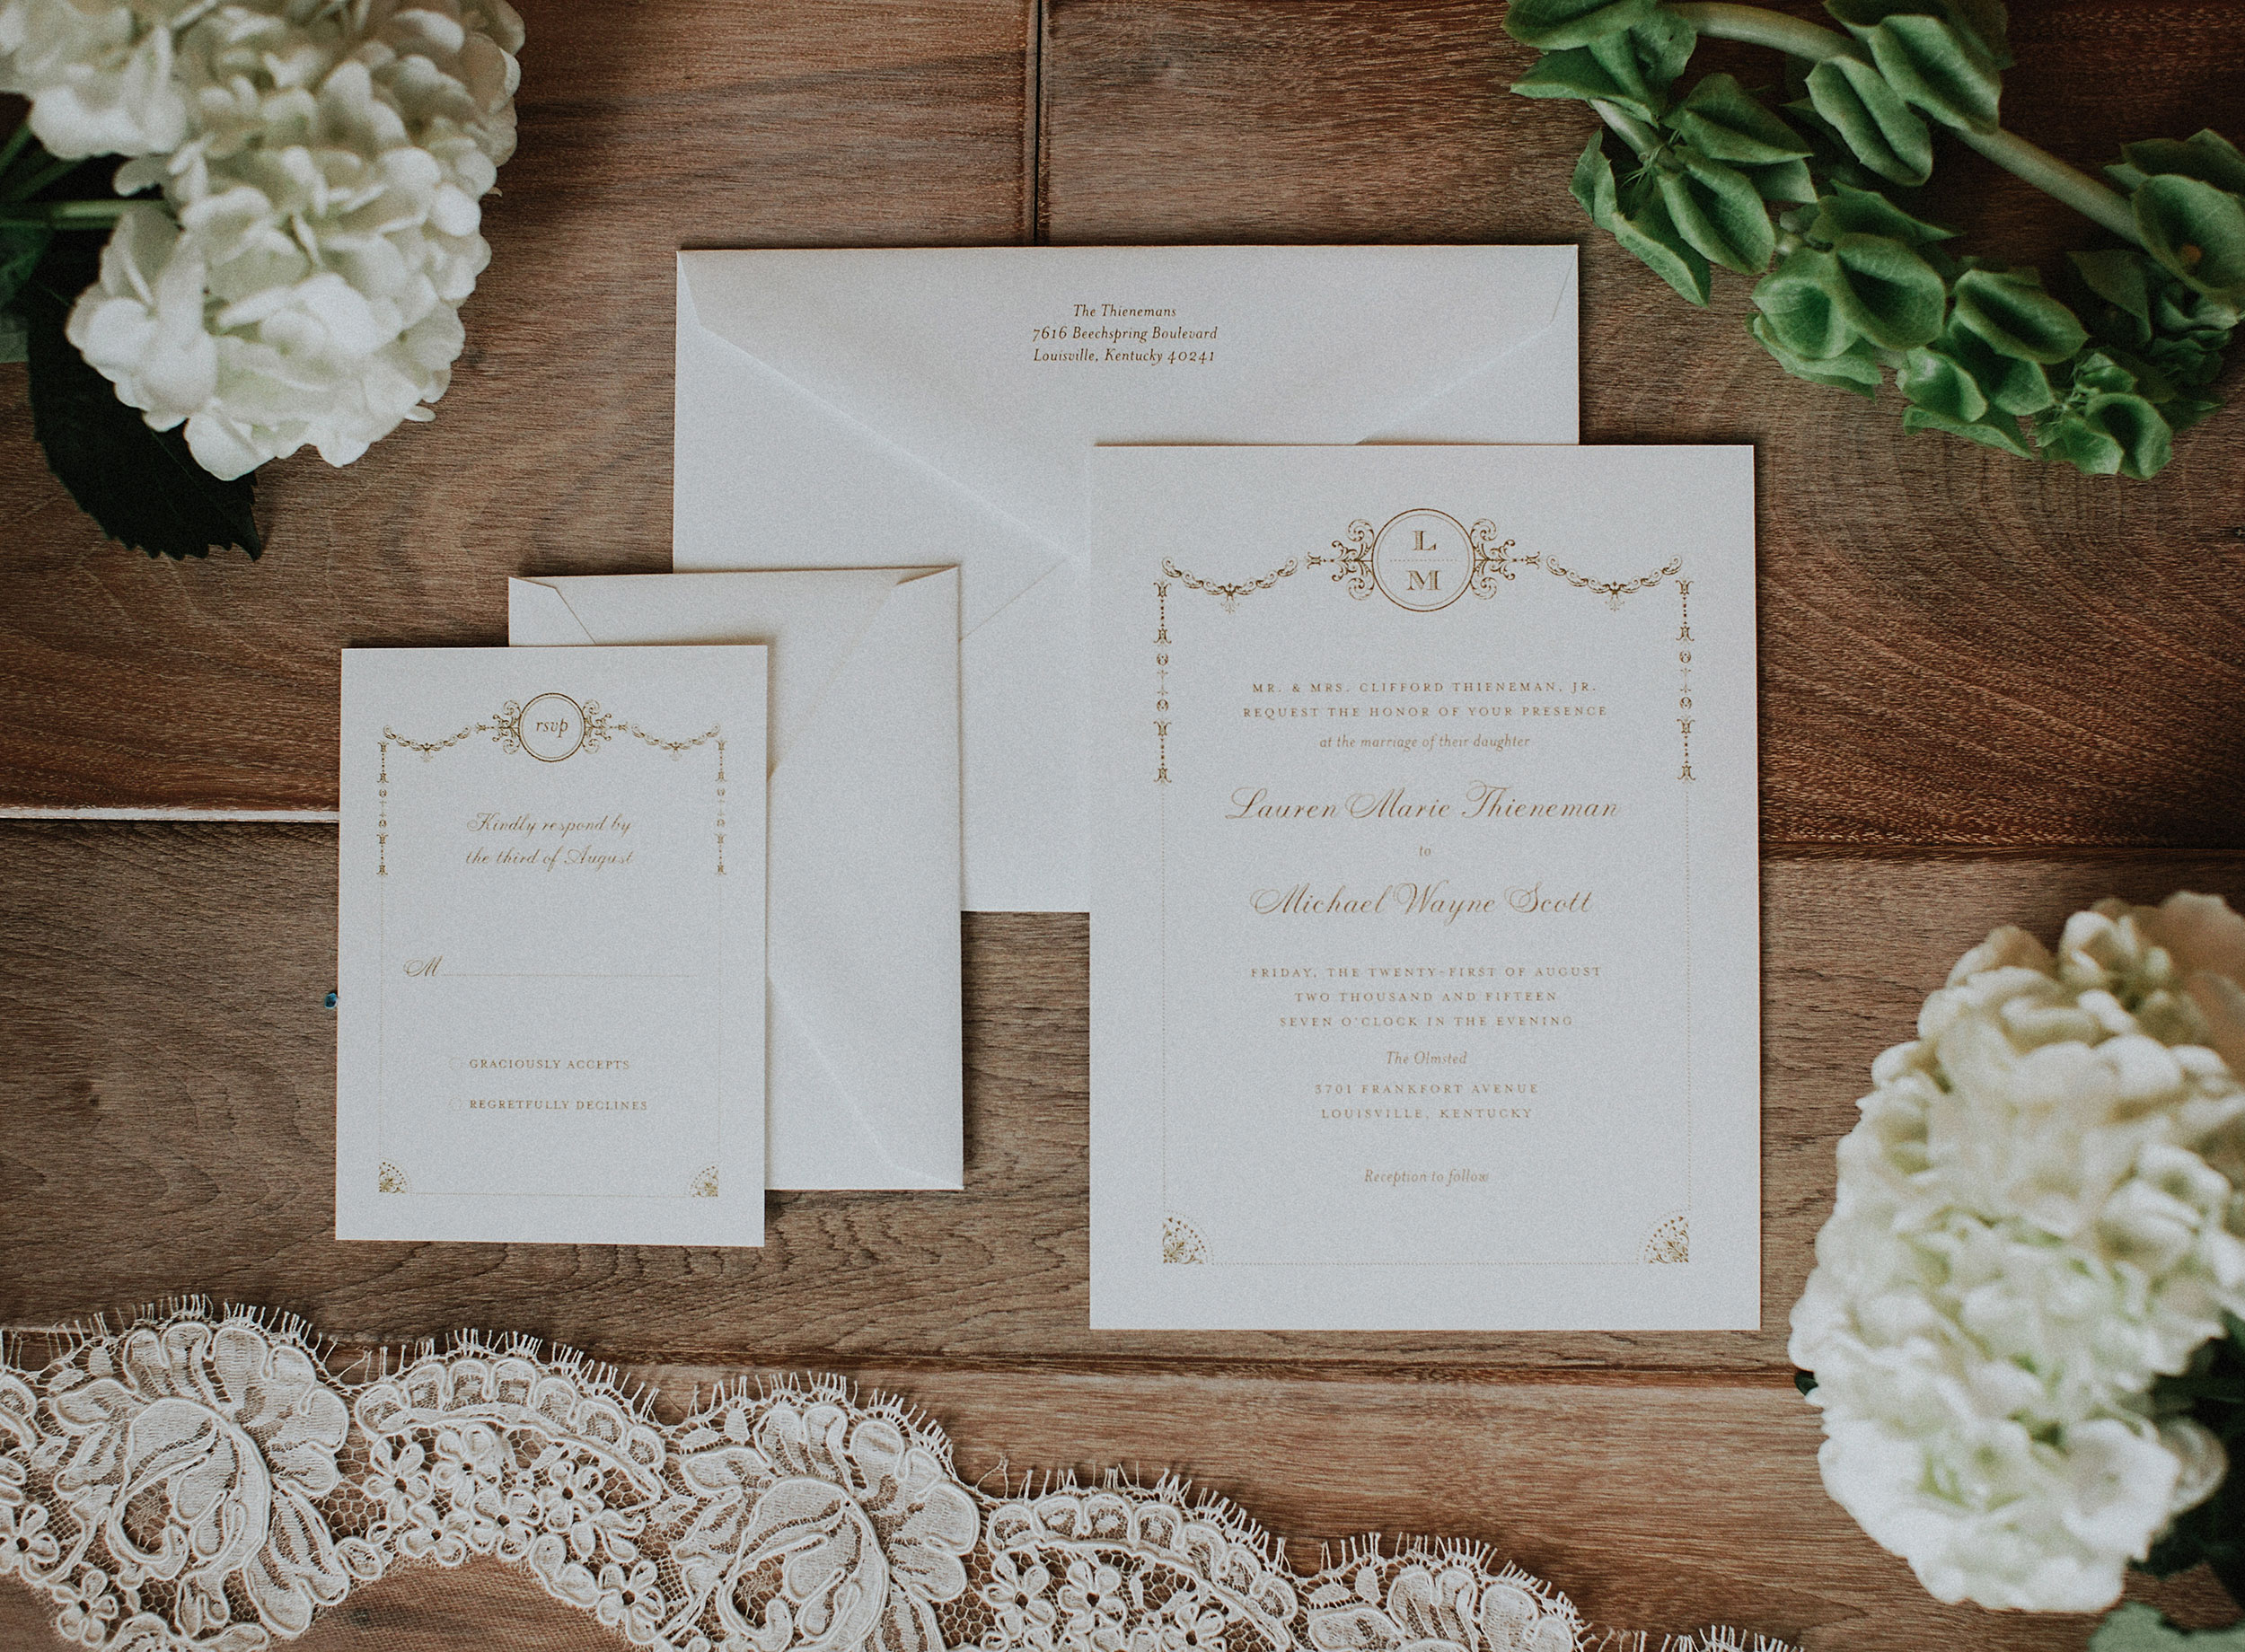 olmsted-wedding-louisville-kentucky-008.JPG